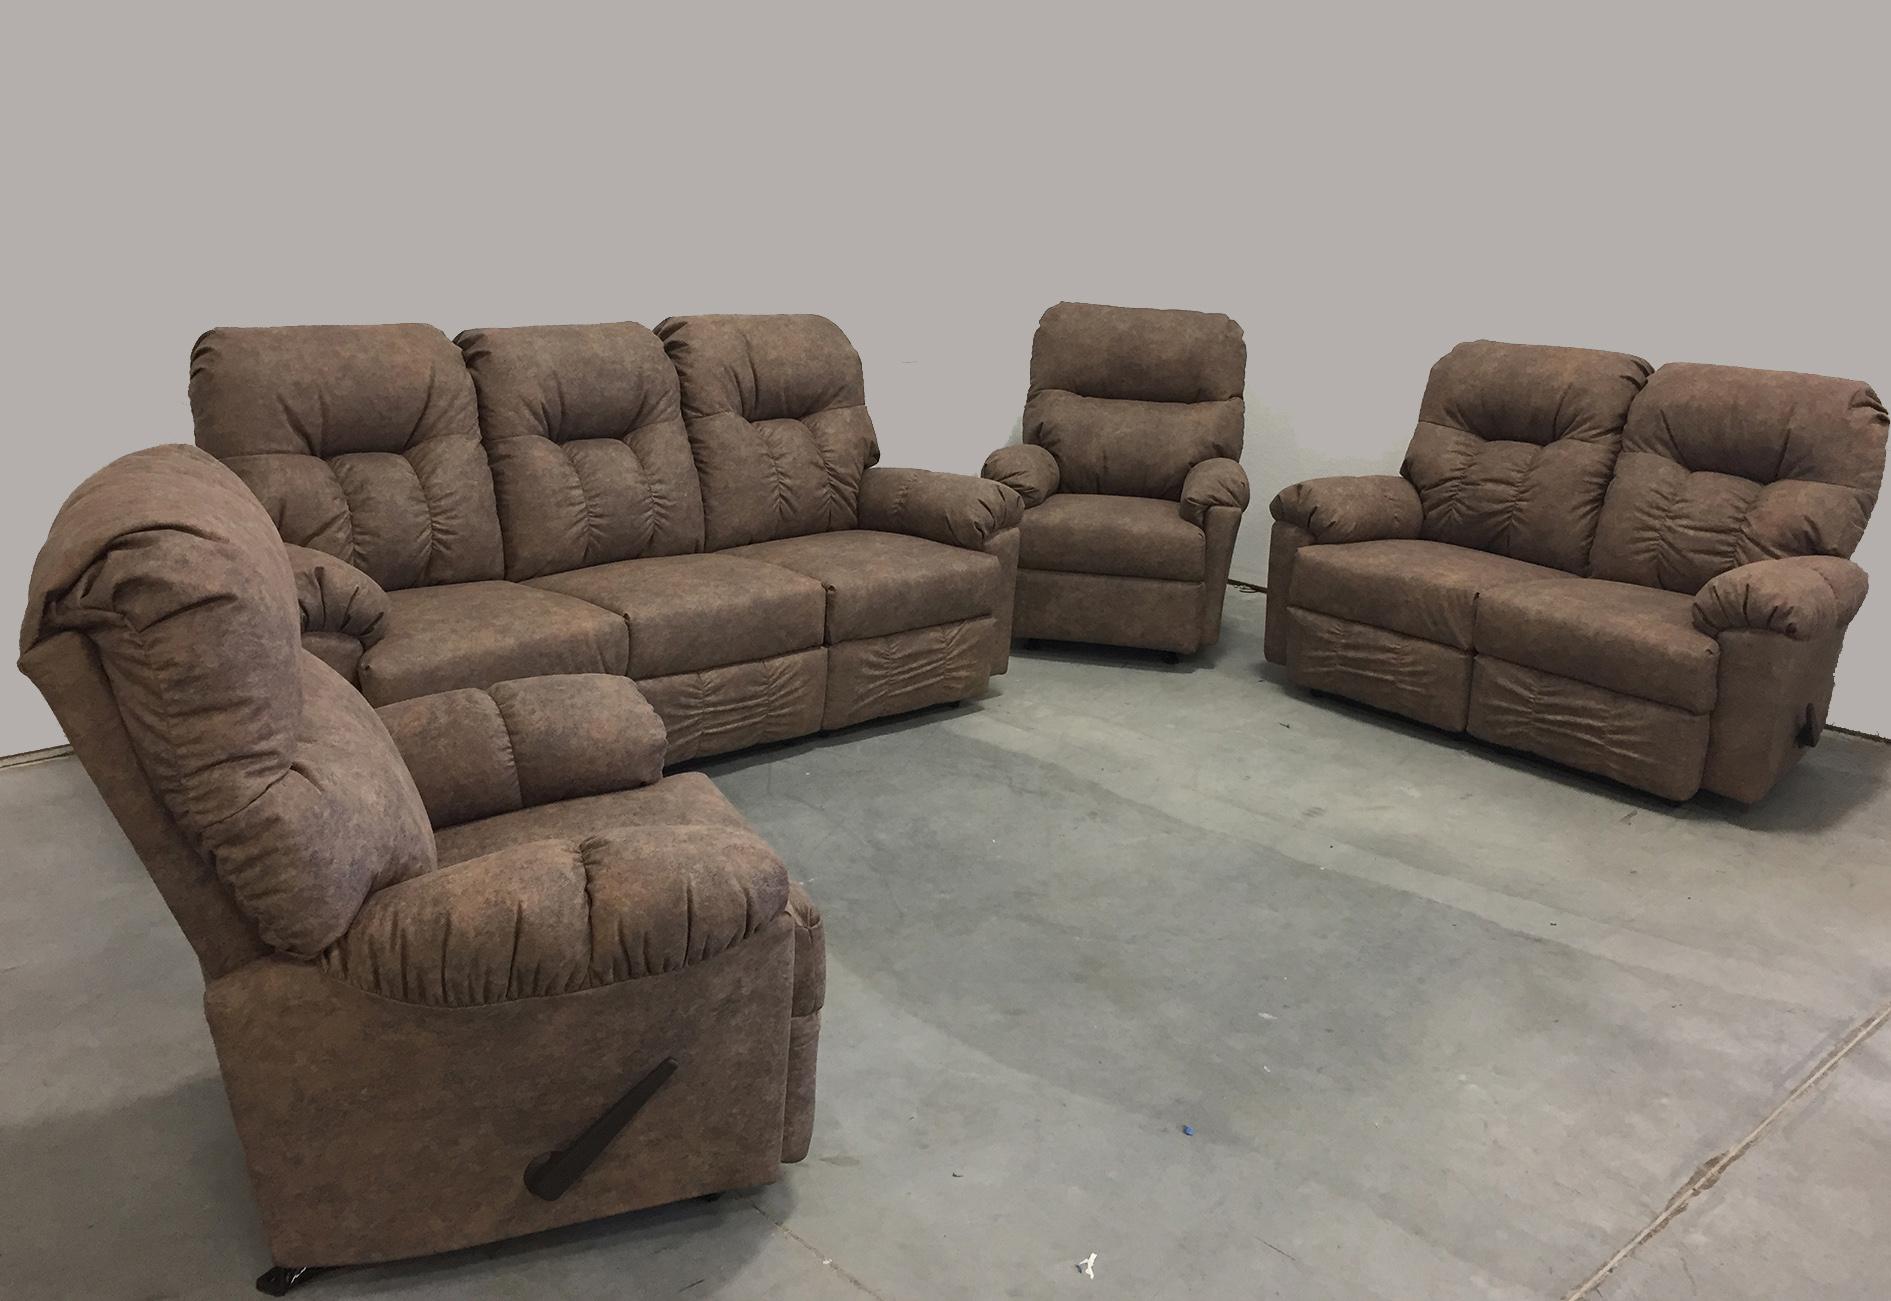 Brilliant Weaver Furniture Sales Event Information Amish Furniture Beatyapartments Chair Design Images Beatyapartmentscom